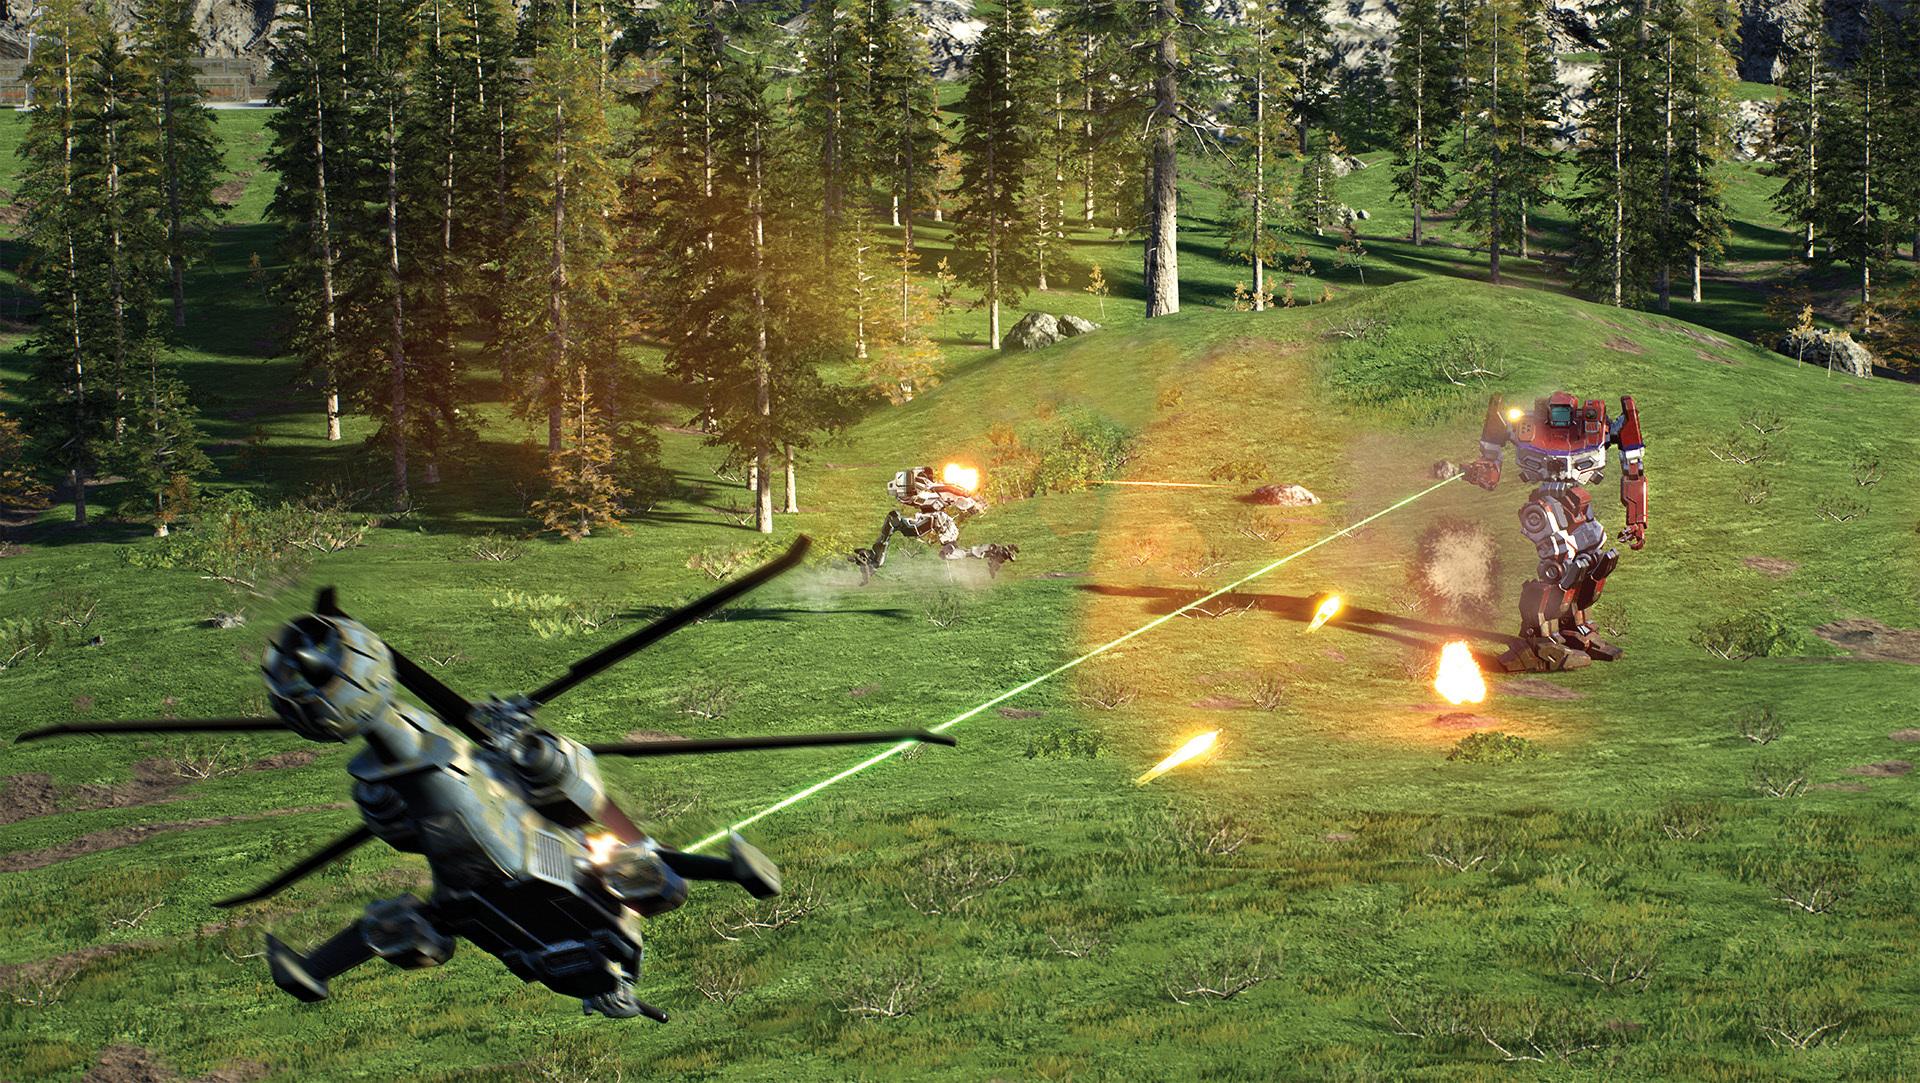 PC Gamer: MechWarrior 5: Mercenaries hands-on & screens | NeoGAF